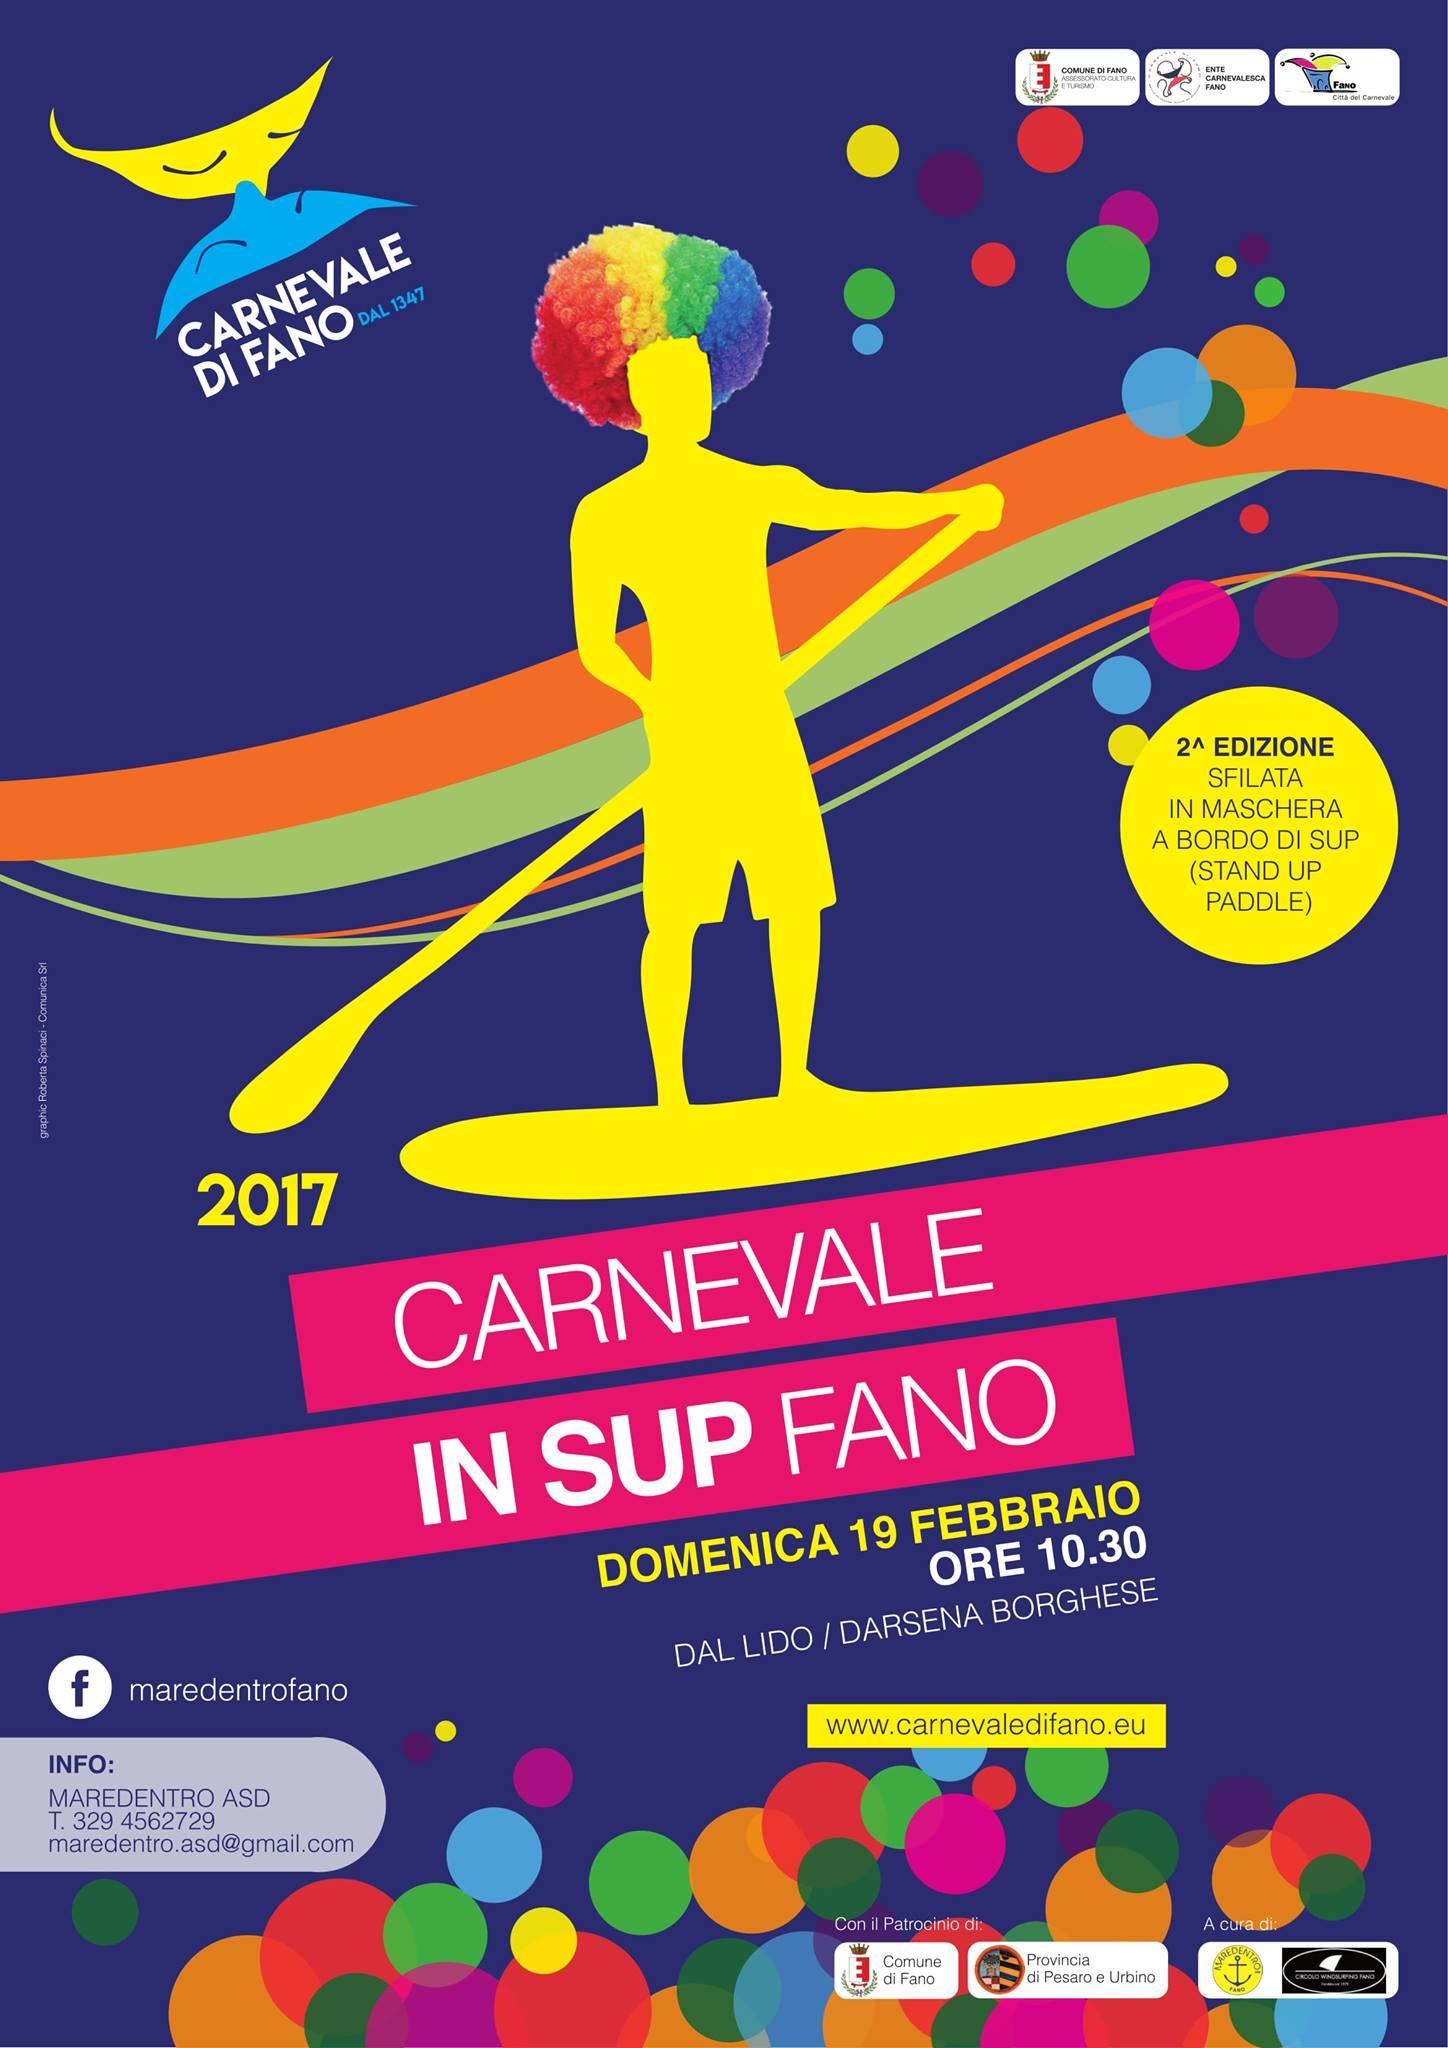 sup-news-2017-carnevale-fano